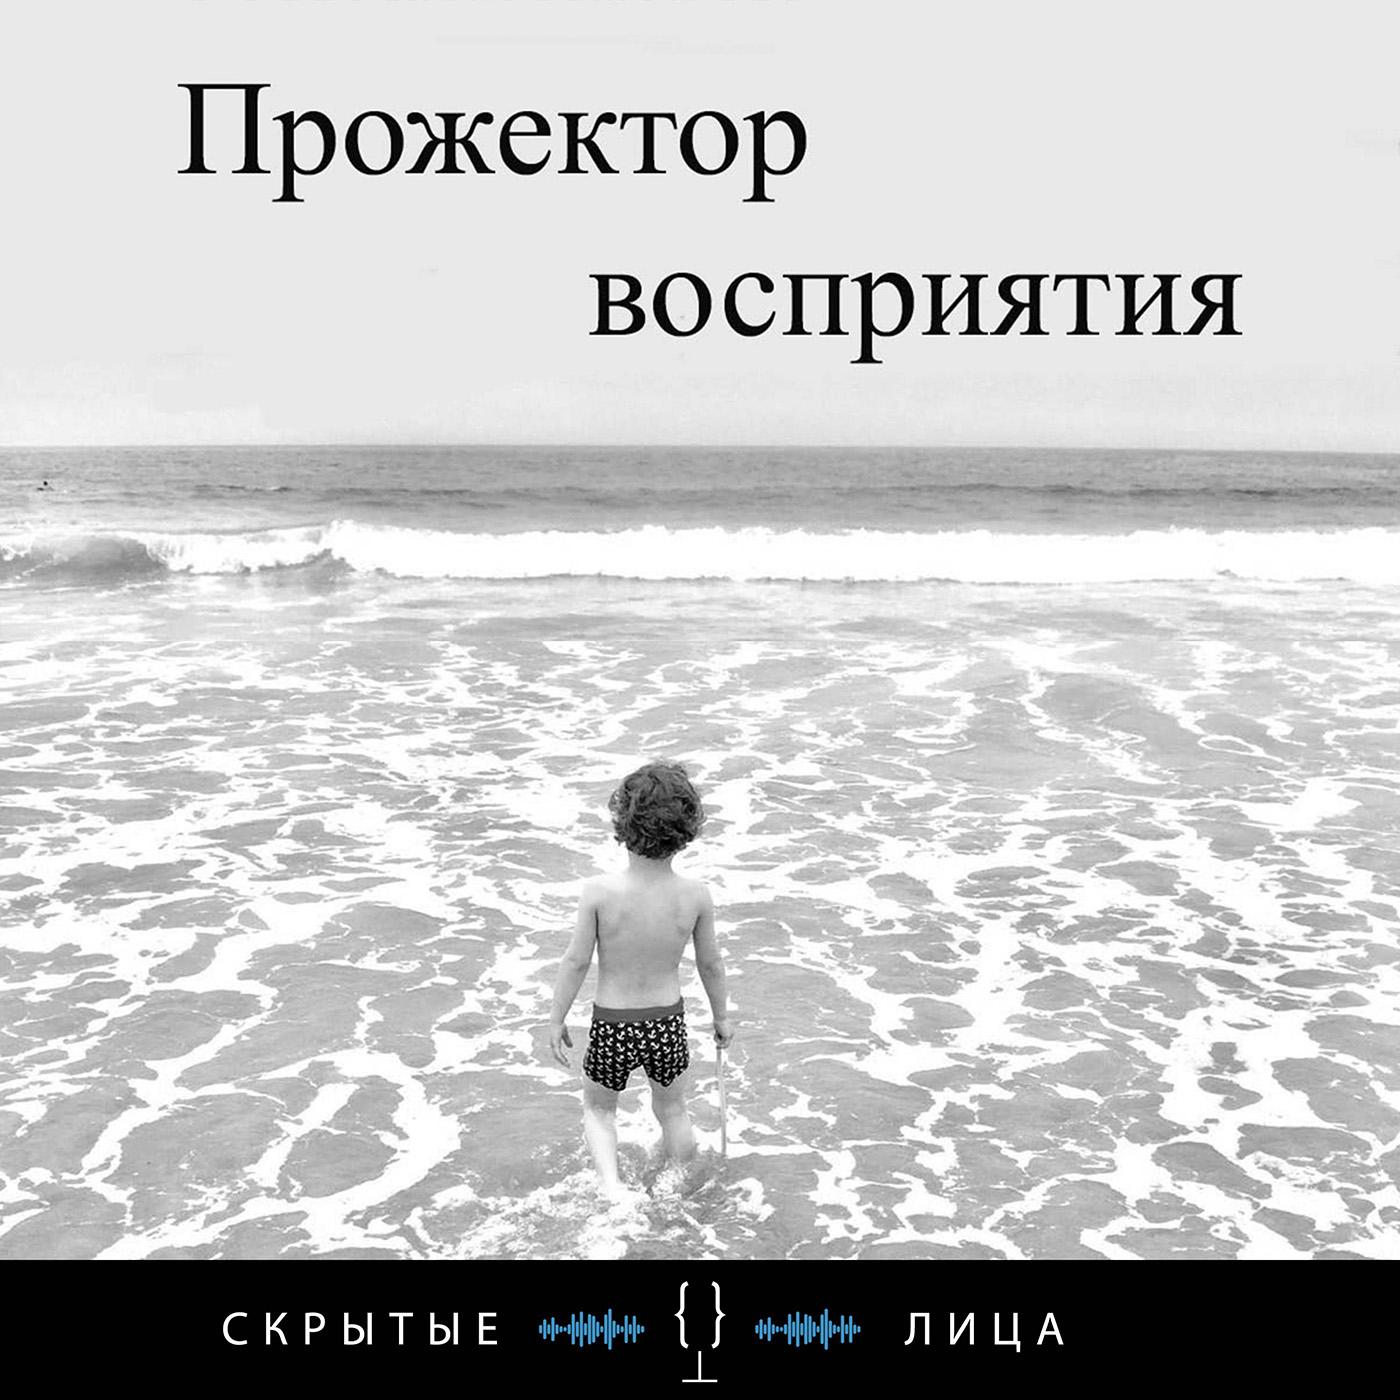 Владимир Марковский Бизнес кинотеатров владимир марковский чай габа